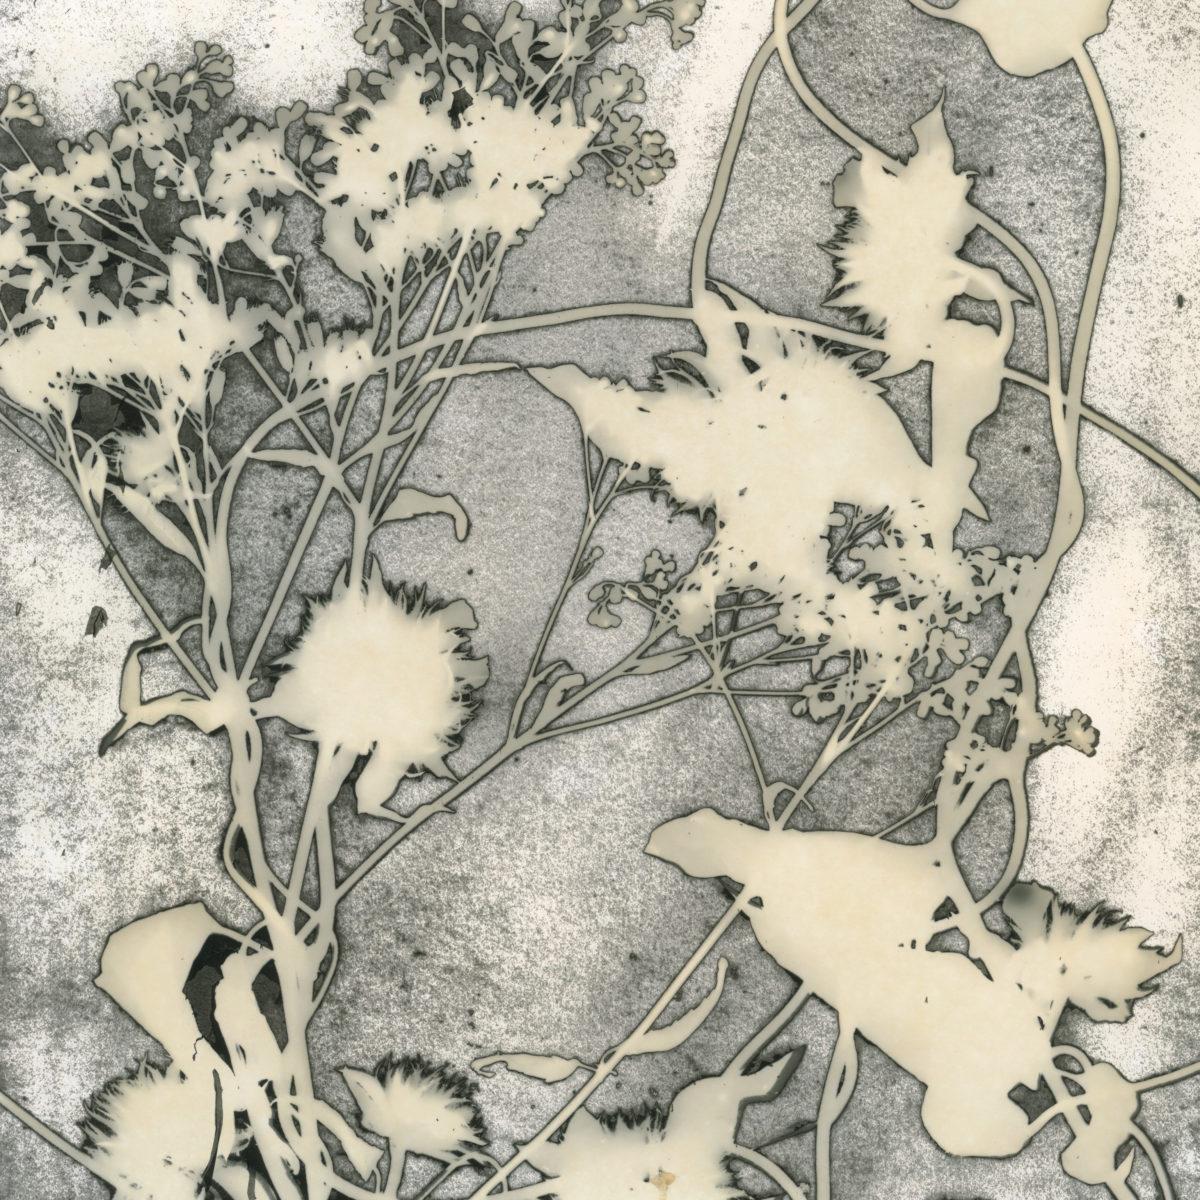 AugustReverie#4_ArtHunt_Dropbox-May-Perkins-Benton